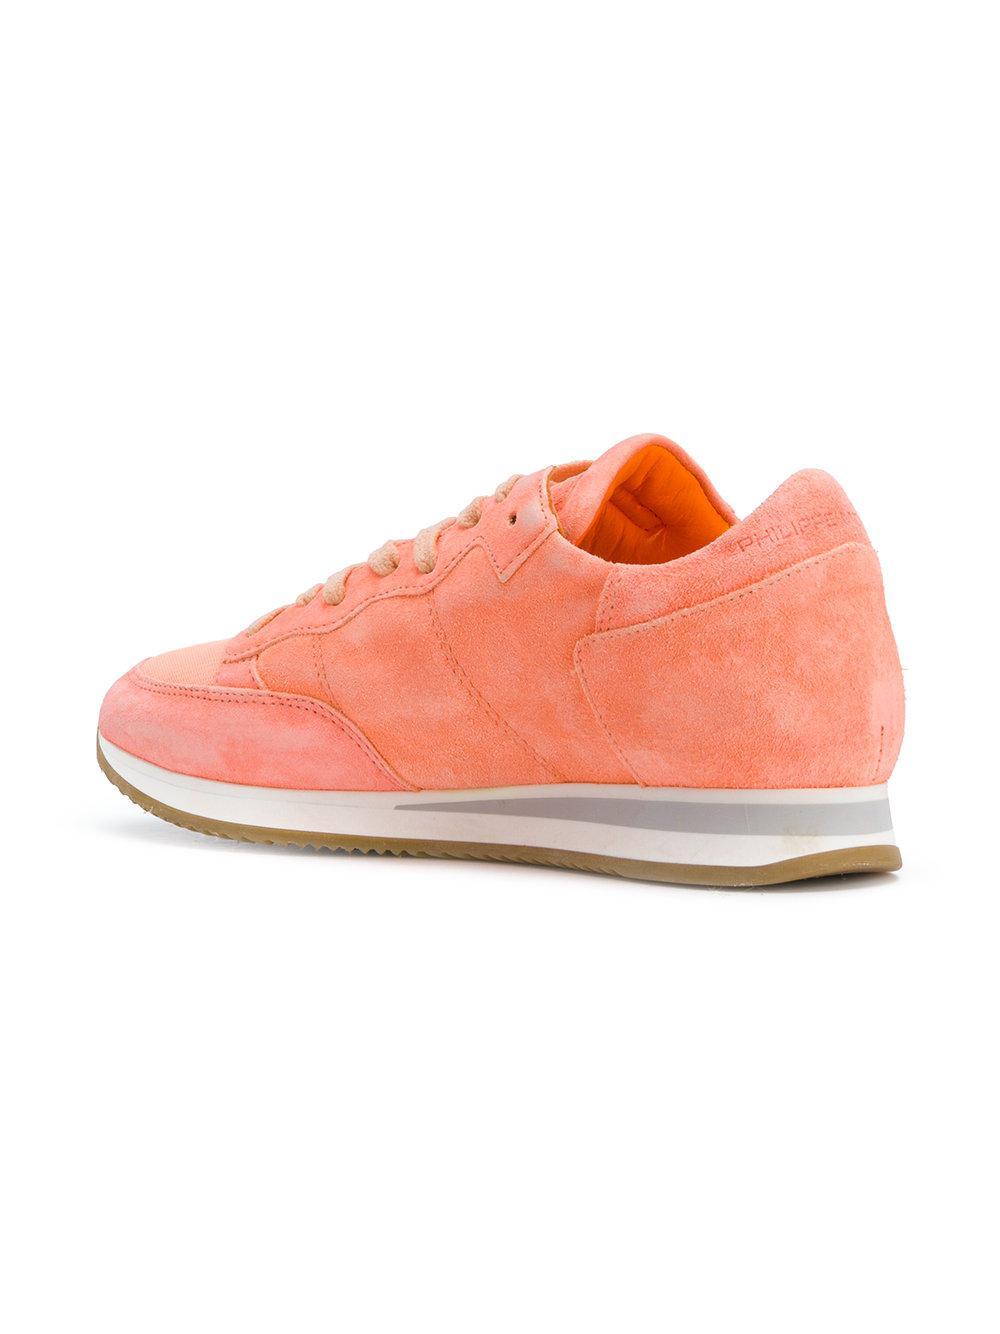 Philippe Model Suede Tropez Sneakers in Yellow & Orange (Pink)